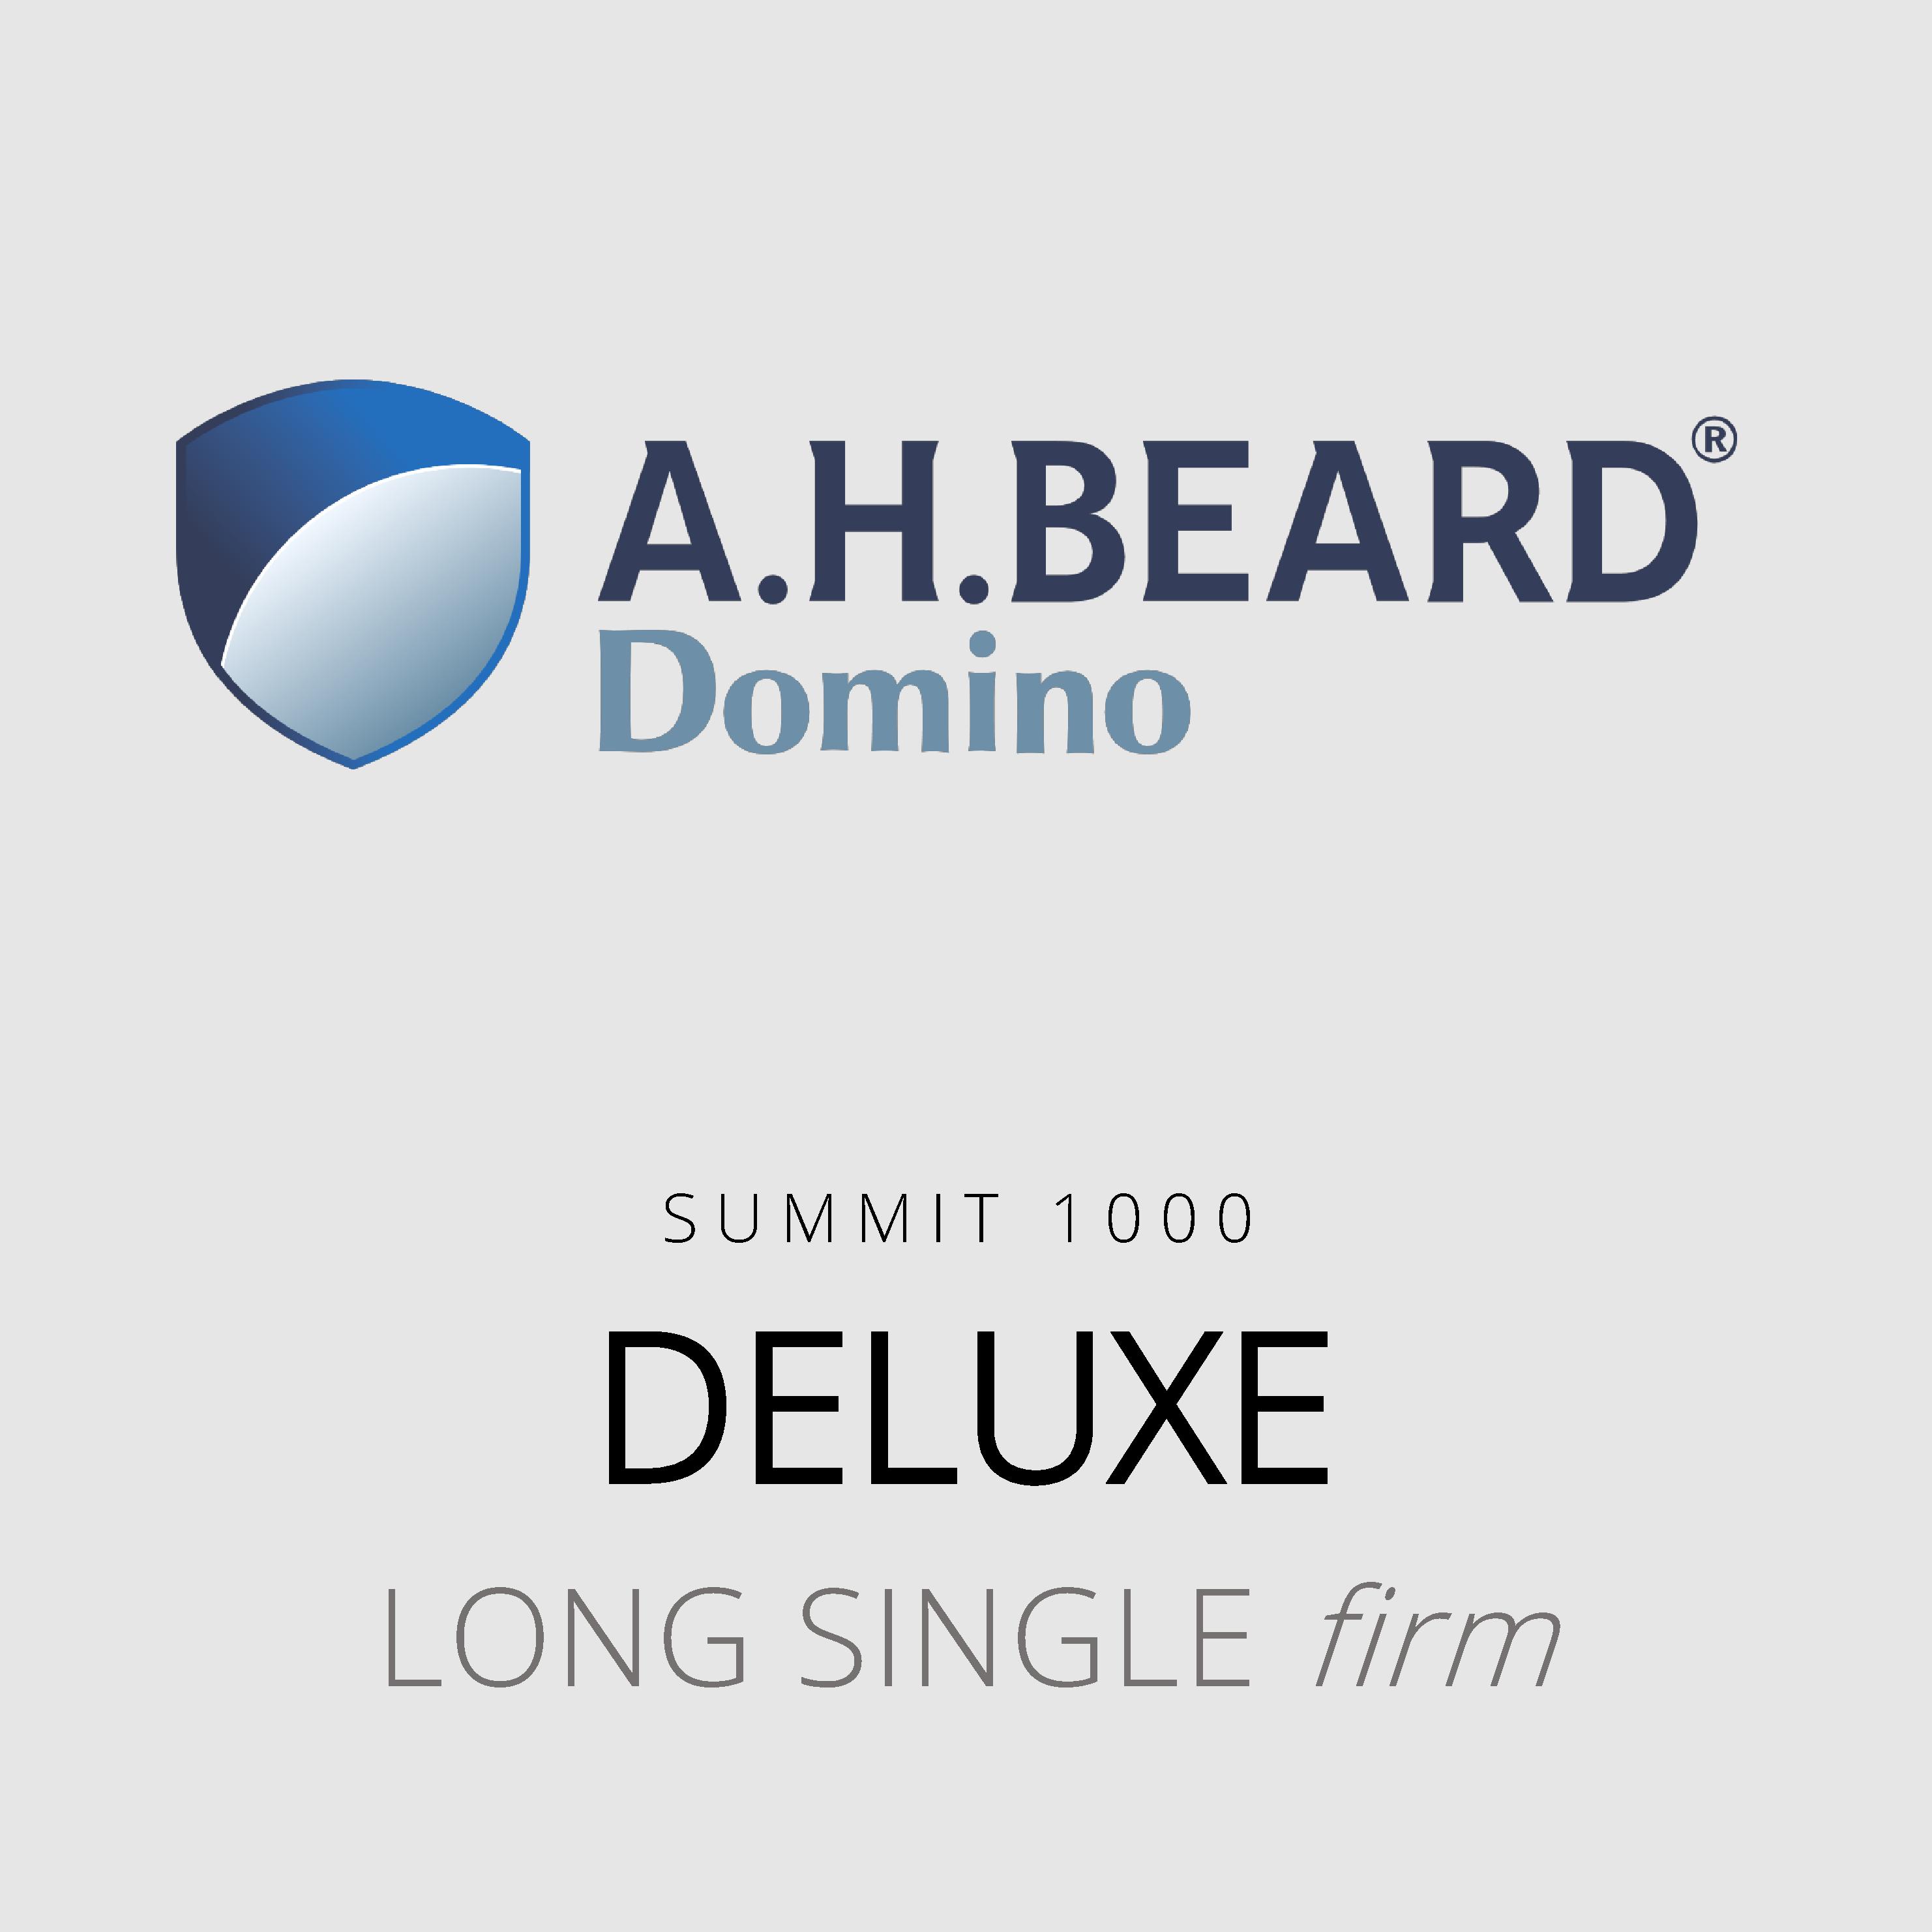 AH Beard Domino – Deluxe – Summit 1000 – Long Single Firm Mattress